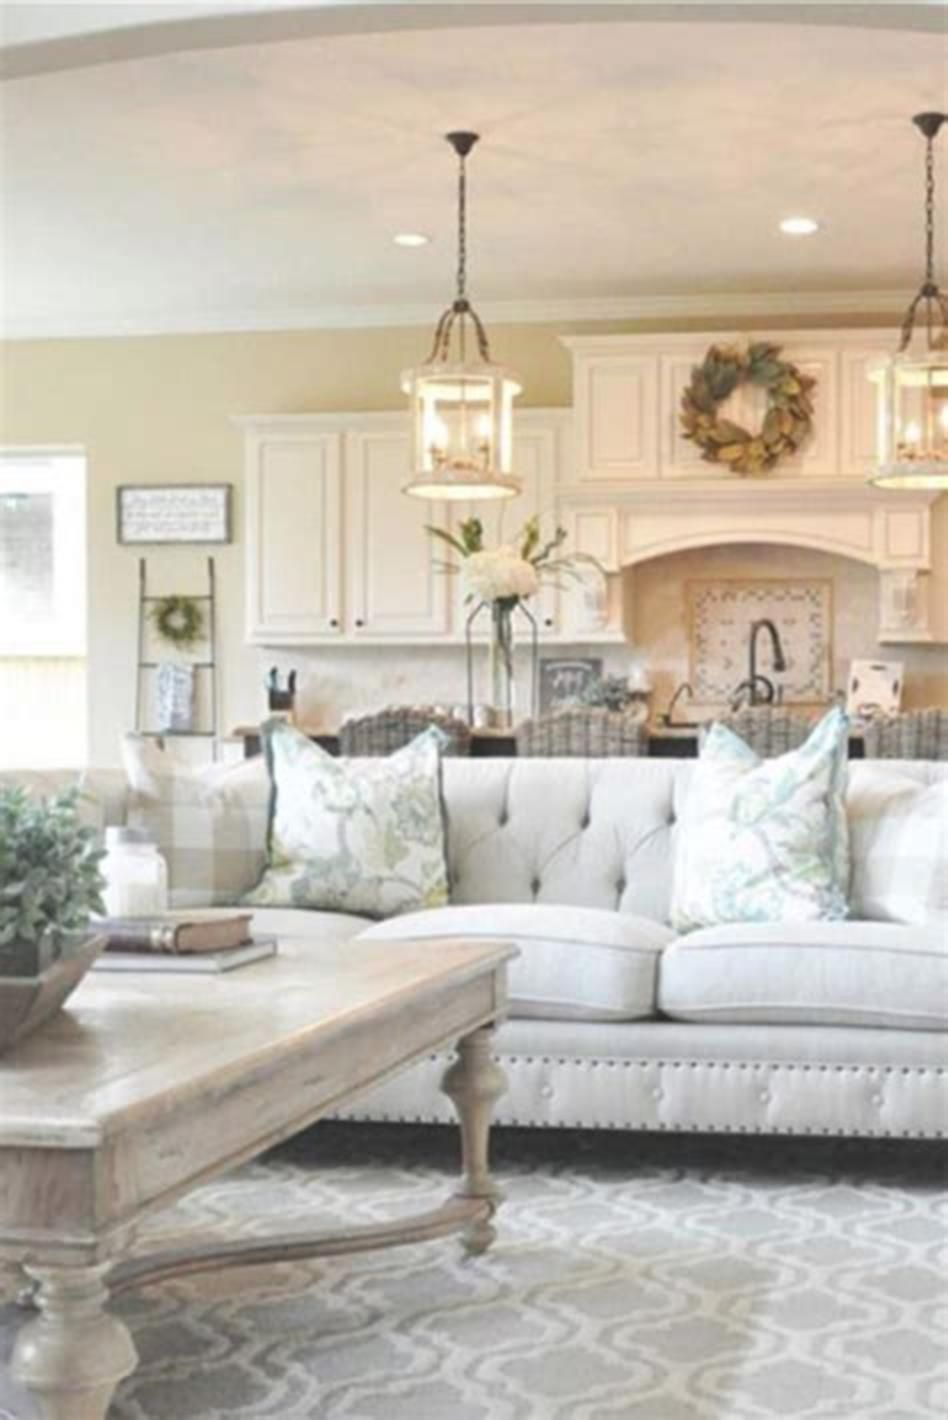 30 Best Shabby Chic Farmhouse Living Room Decor Ideas 2019 Craft Home Ideas Country Living Room Farm House Living Room Farmhouse Decor Living Room #shabby #chic #farmhouse #living #room